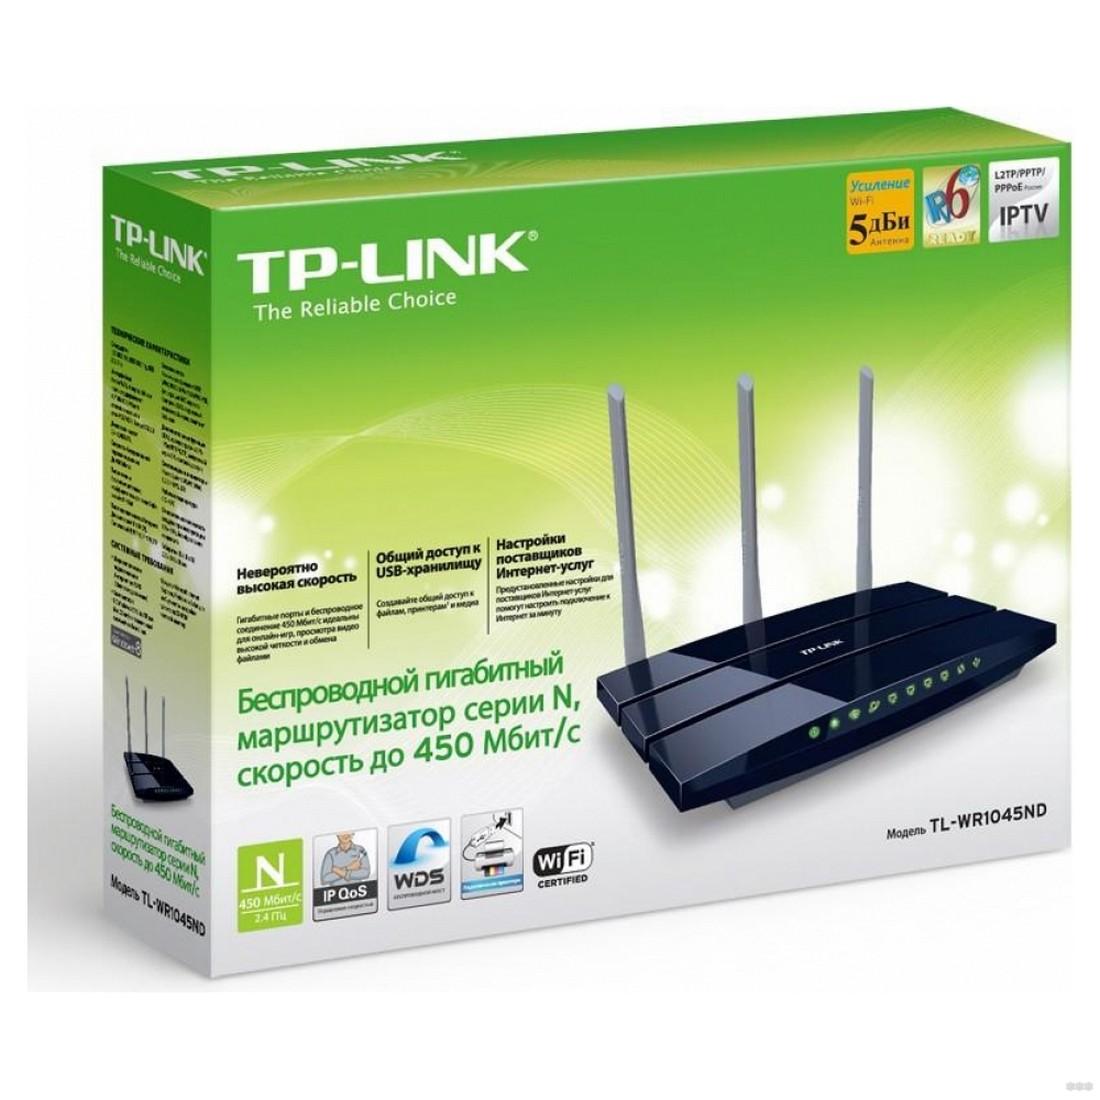 Гигабитный маршрутизатор TP-Link TL-WR1045ND серии N